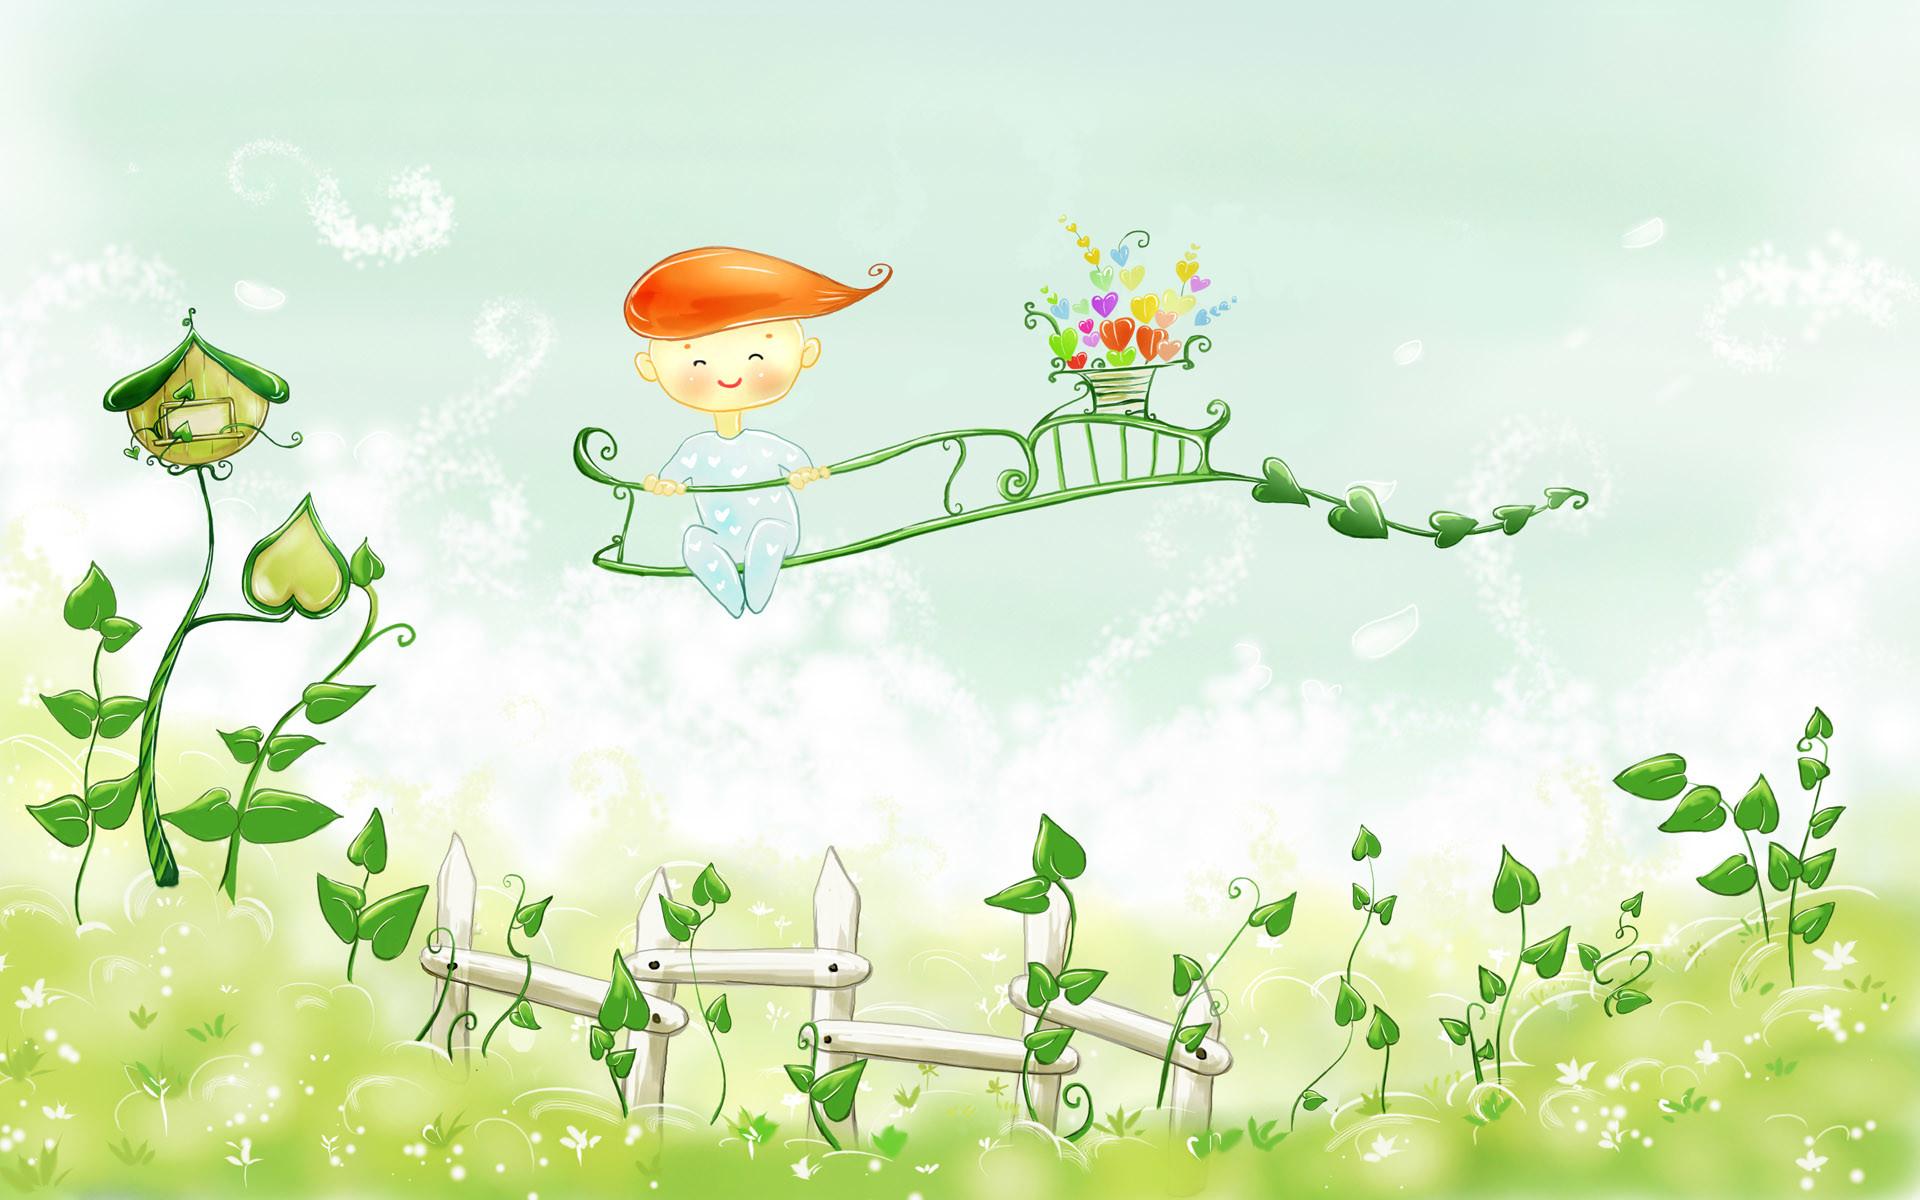 Free HD Image Of Fairy Tale Spring Beautiful Scenery